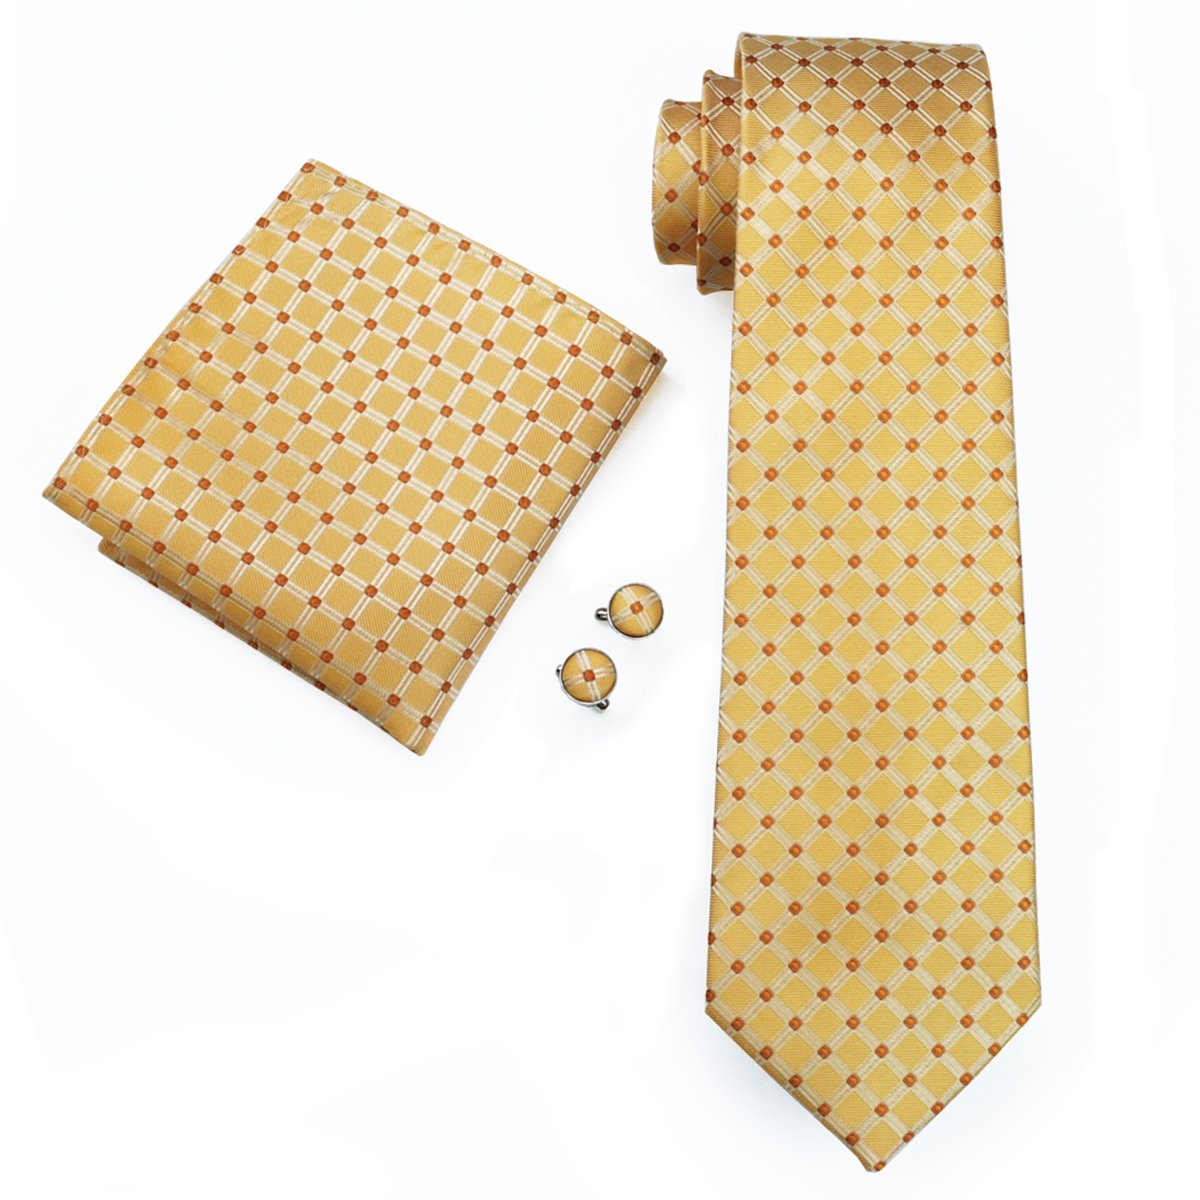 Hi-Tie Classic Gold Champagne Tie Pocket Square and Cufflinks Gift Box set Woven Silk Wedding Necktie N-1517